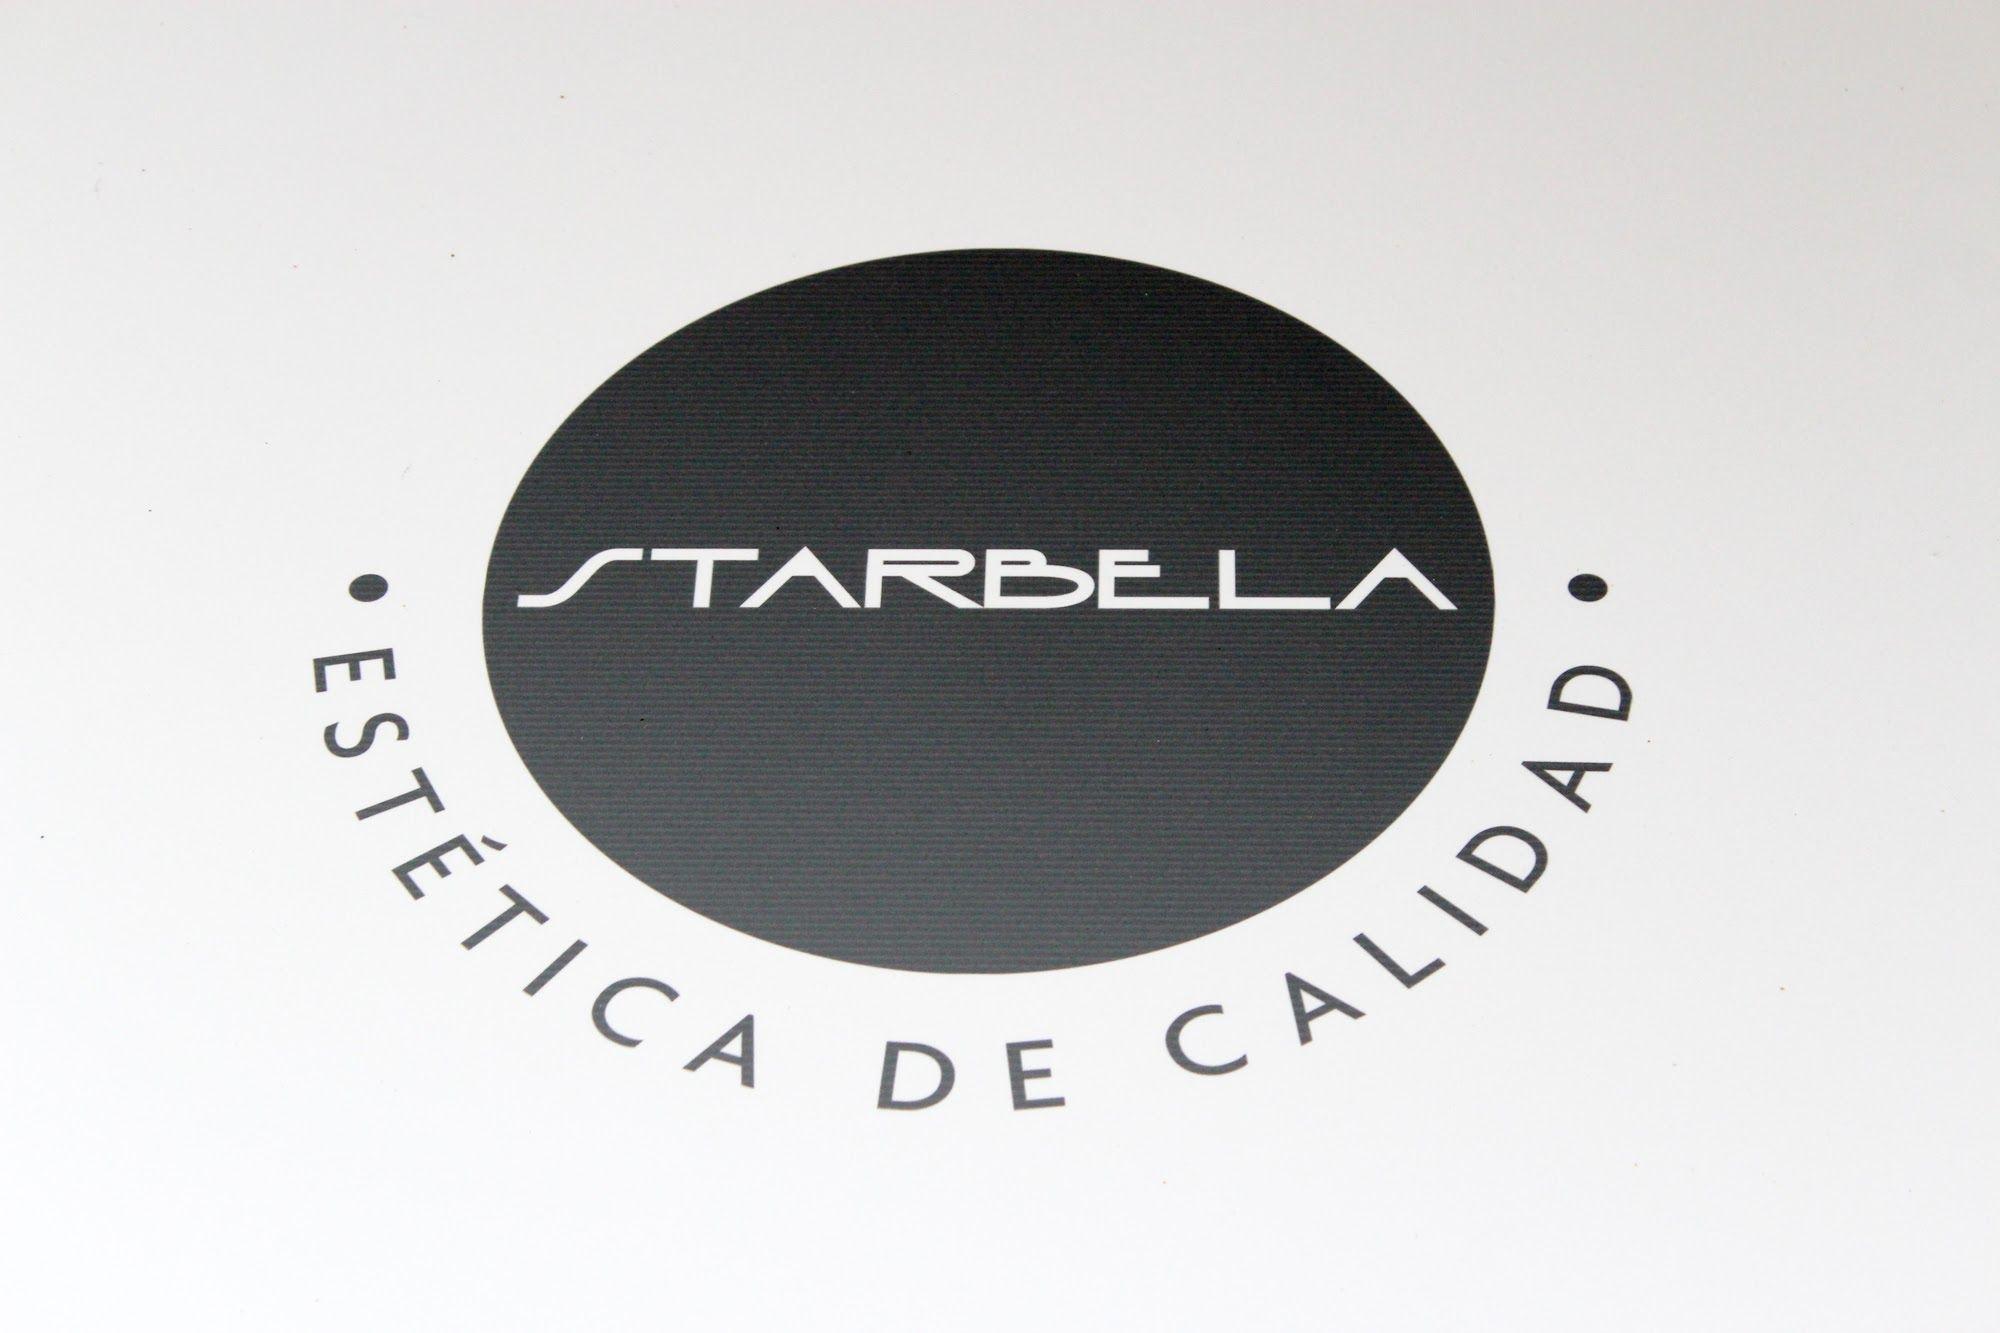 Foto 3 de Centros de estética en Madrid | Starbela